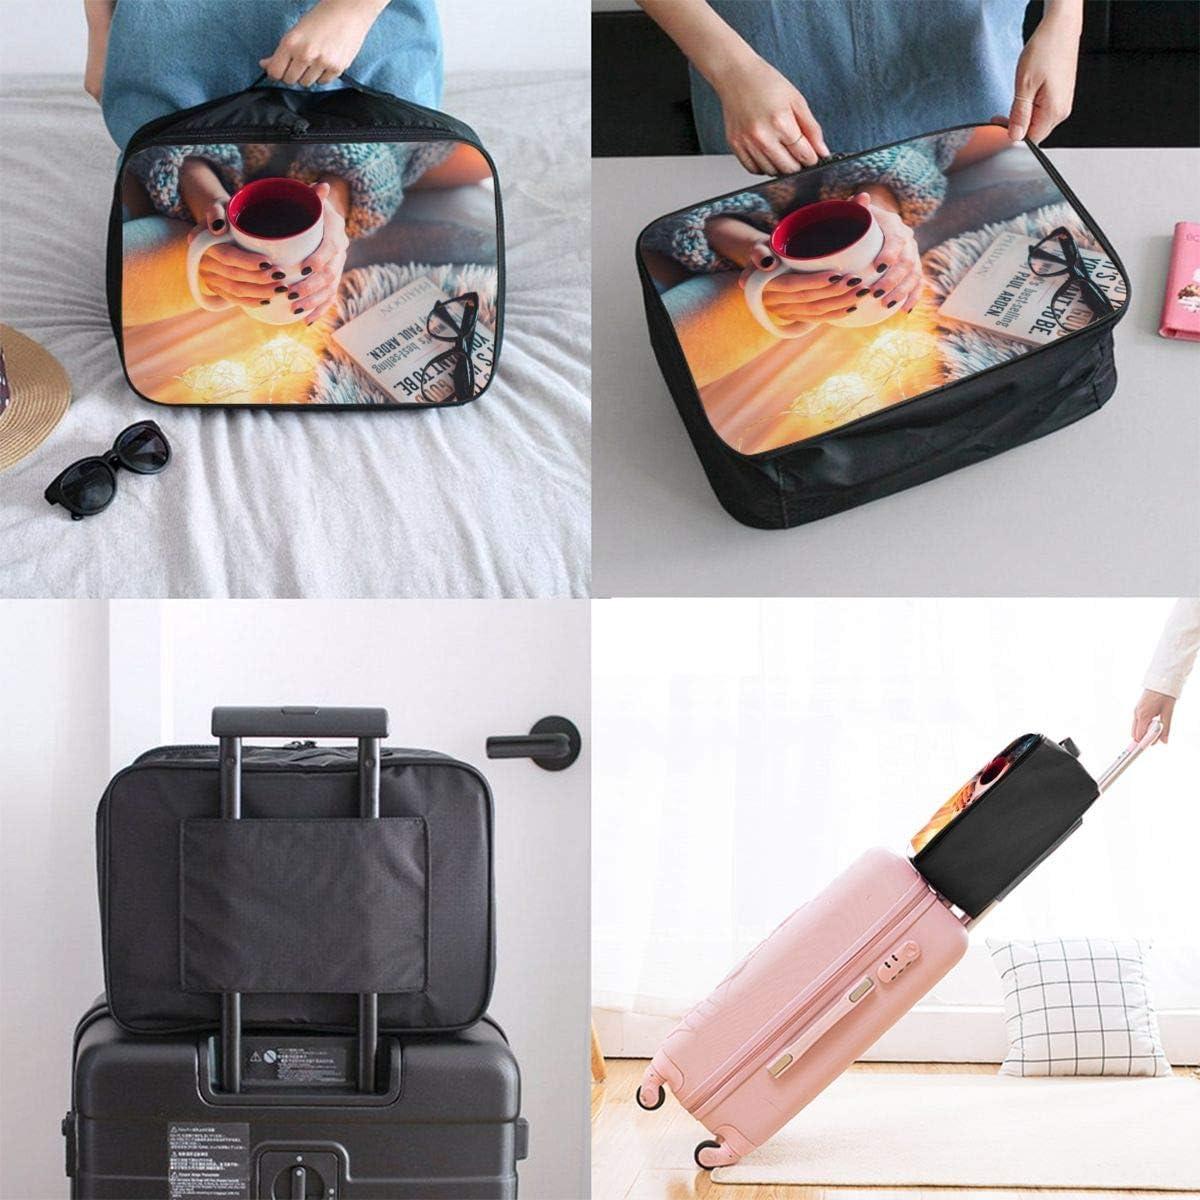 Yunshm Autumn Mood Personalized Trolley Handbag Waterproof Unisex Large Capacity For Business Travel Storage